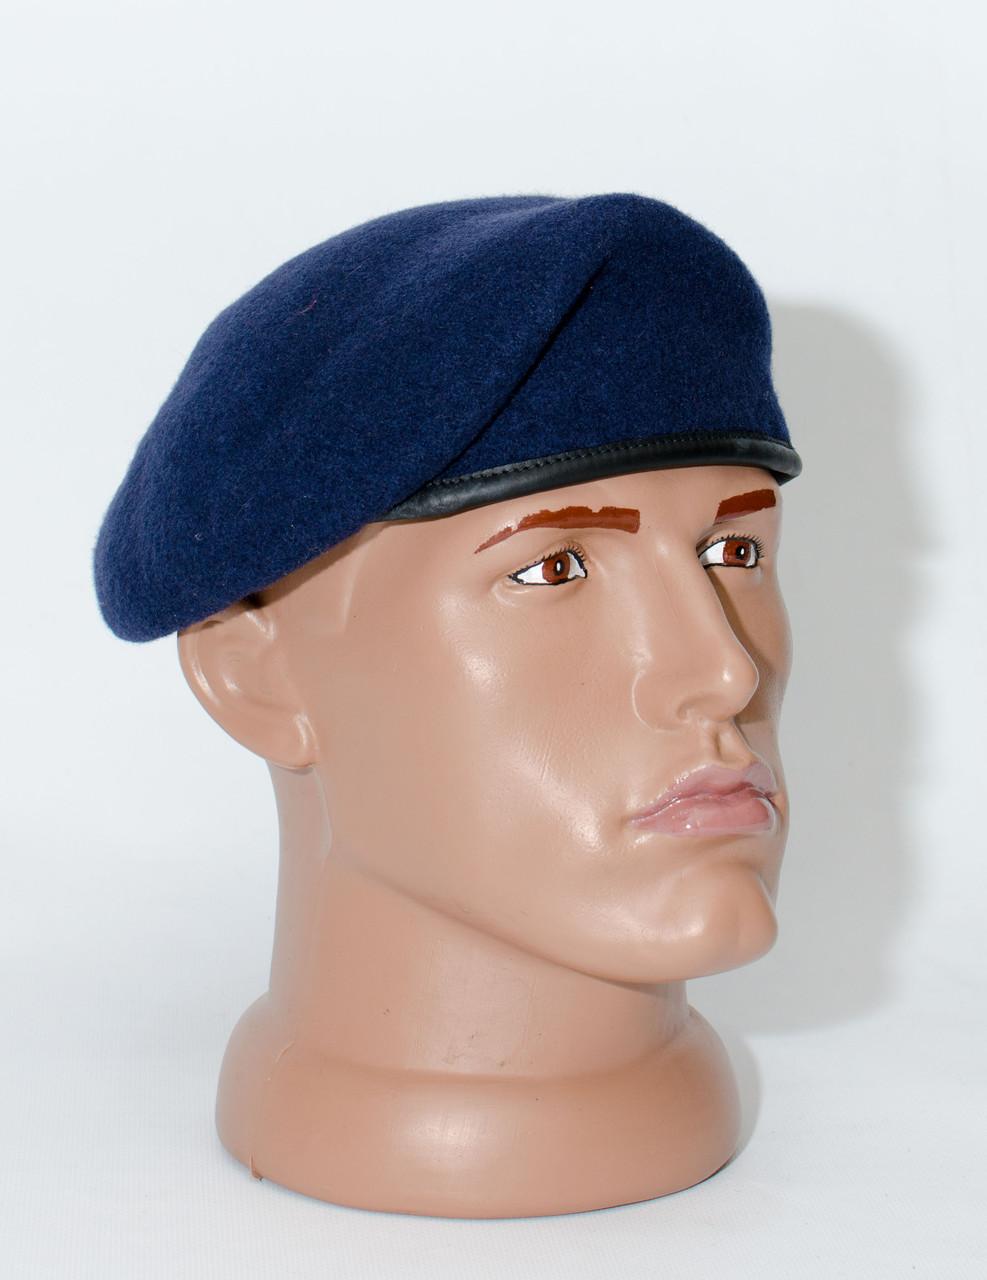 Берет НАТО капелька темно-синий  обитый без фурнитуры